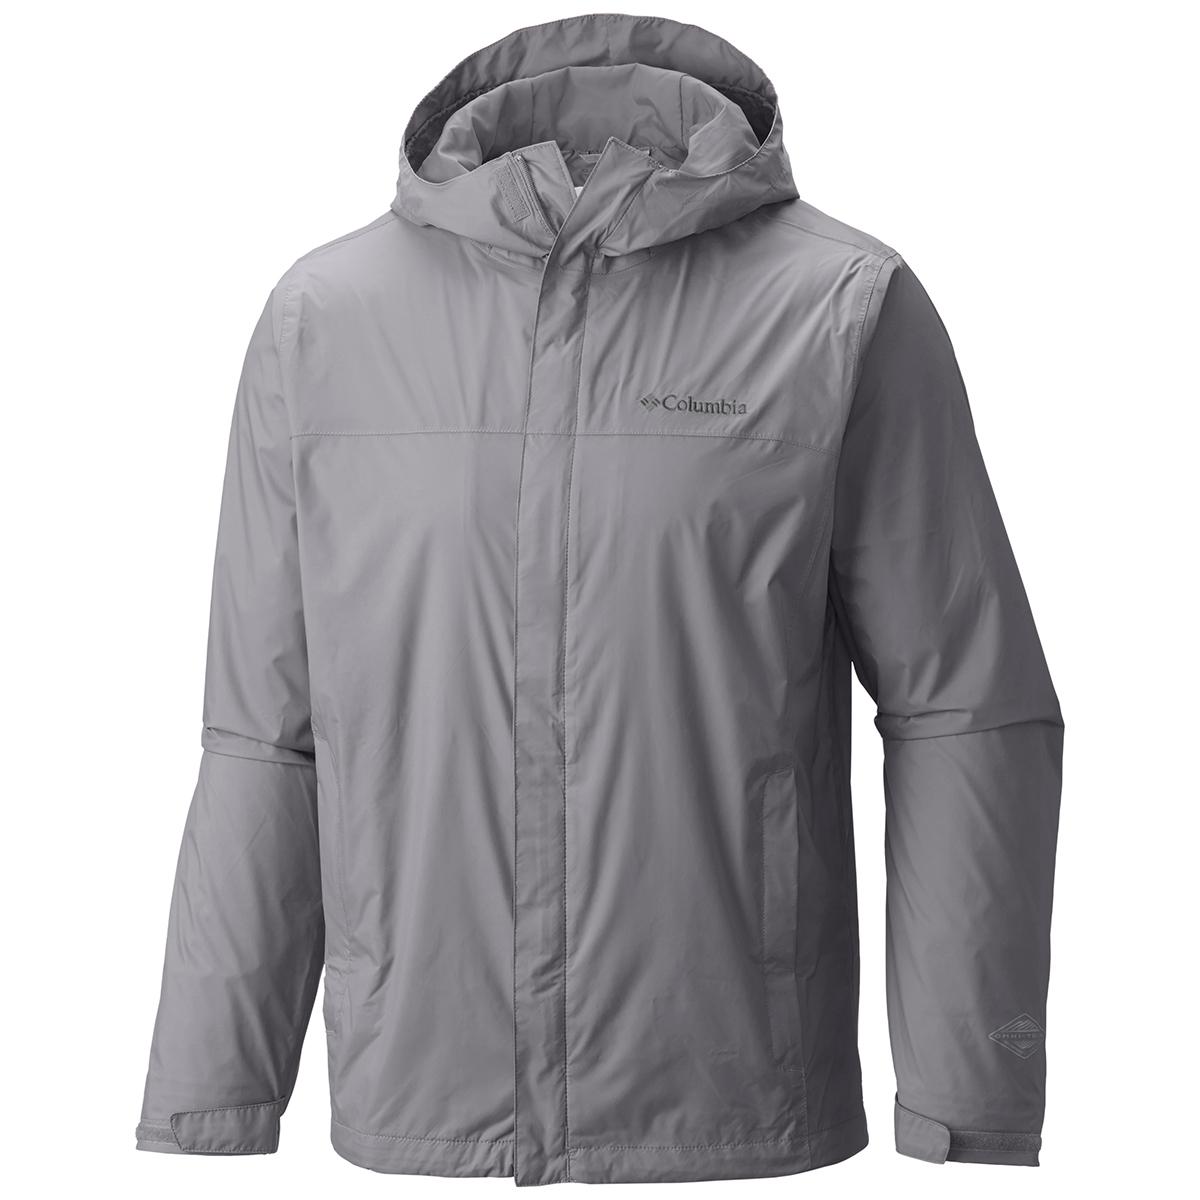 Columbia Men's Watertight Ii Jacket - Black, XL